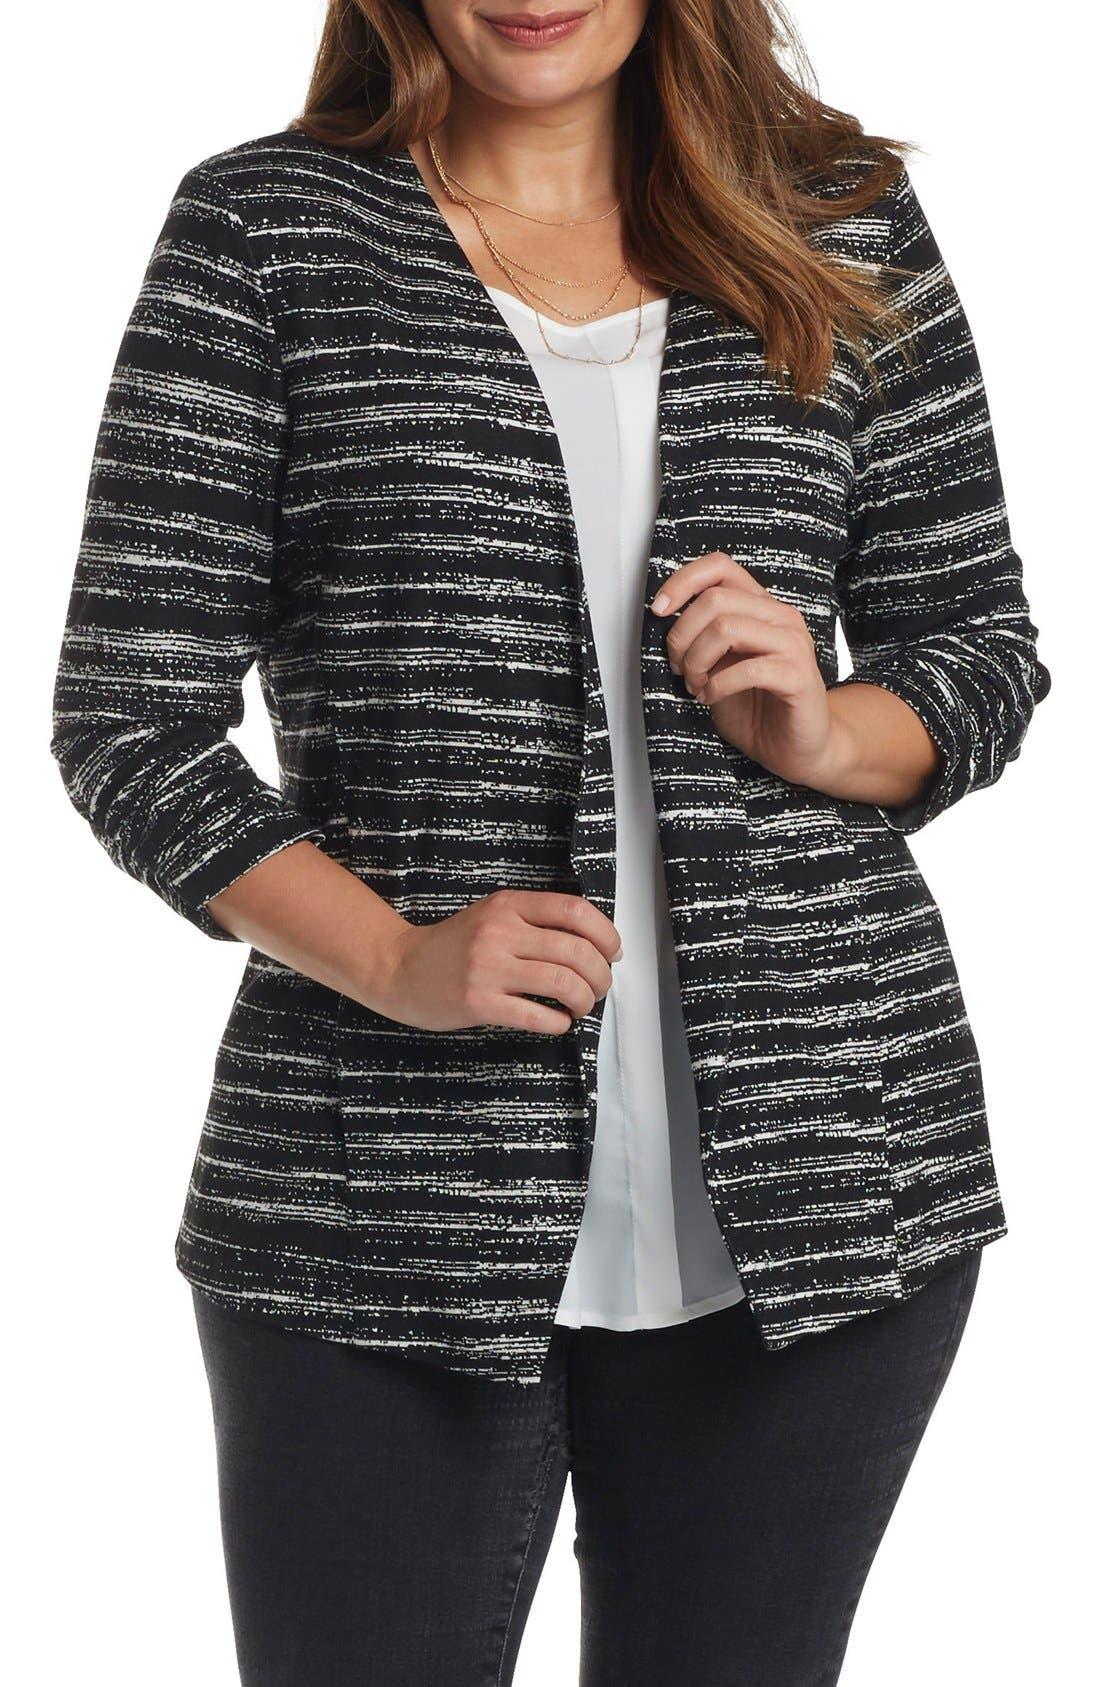 Alternate Image 1 Selected - Tart 'Olga' Knit Jacket (Plus Size)